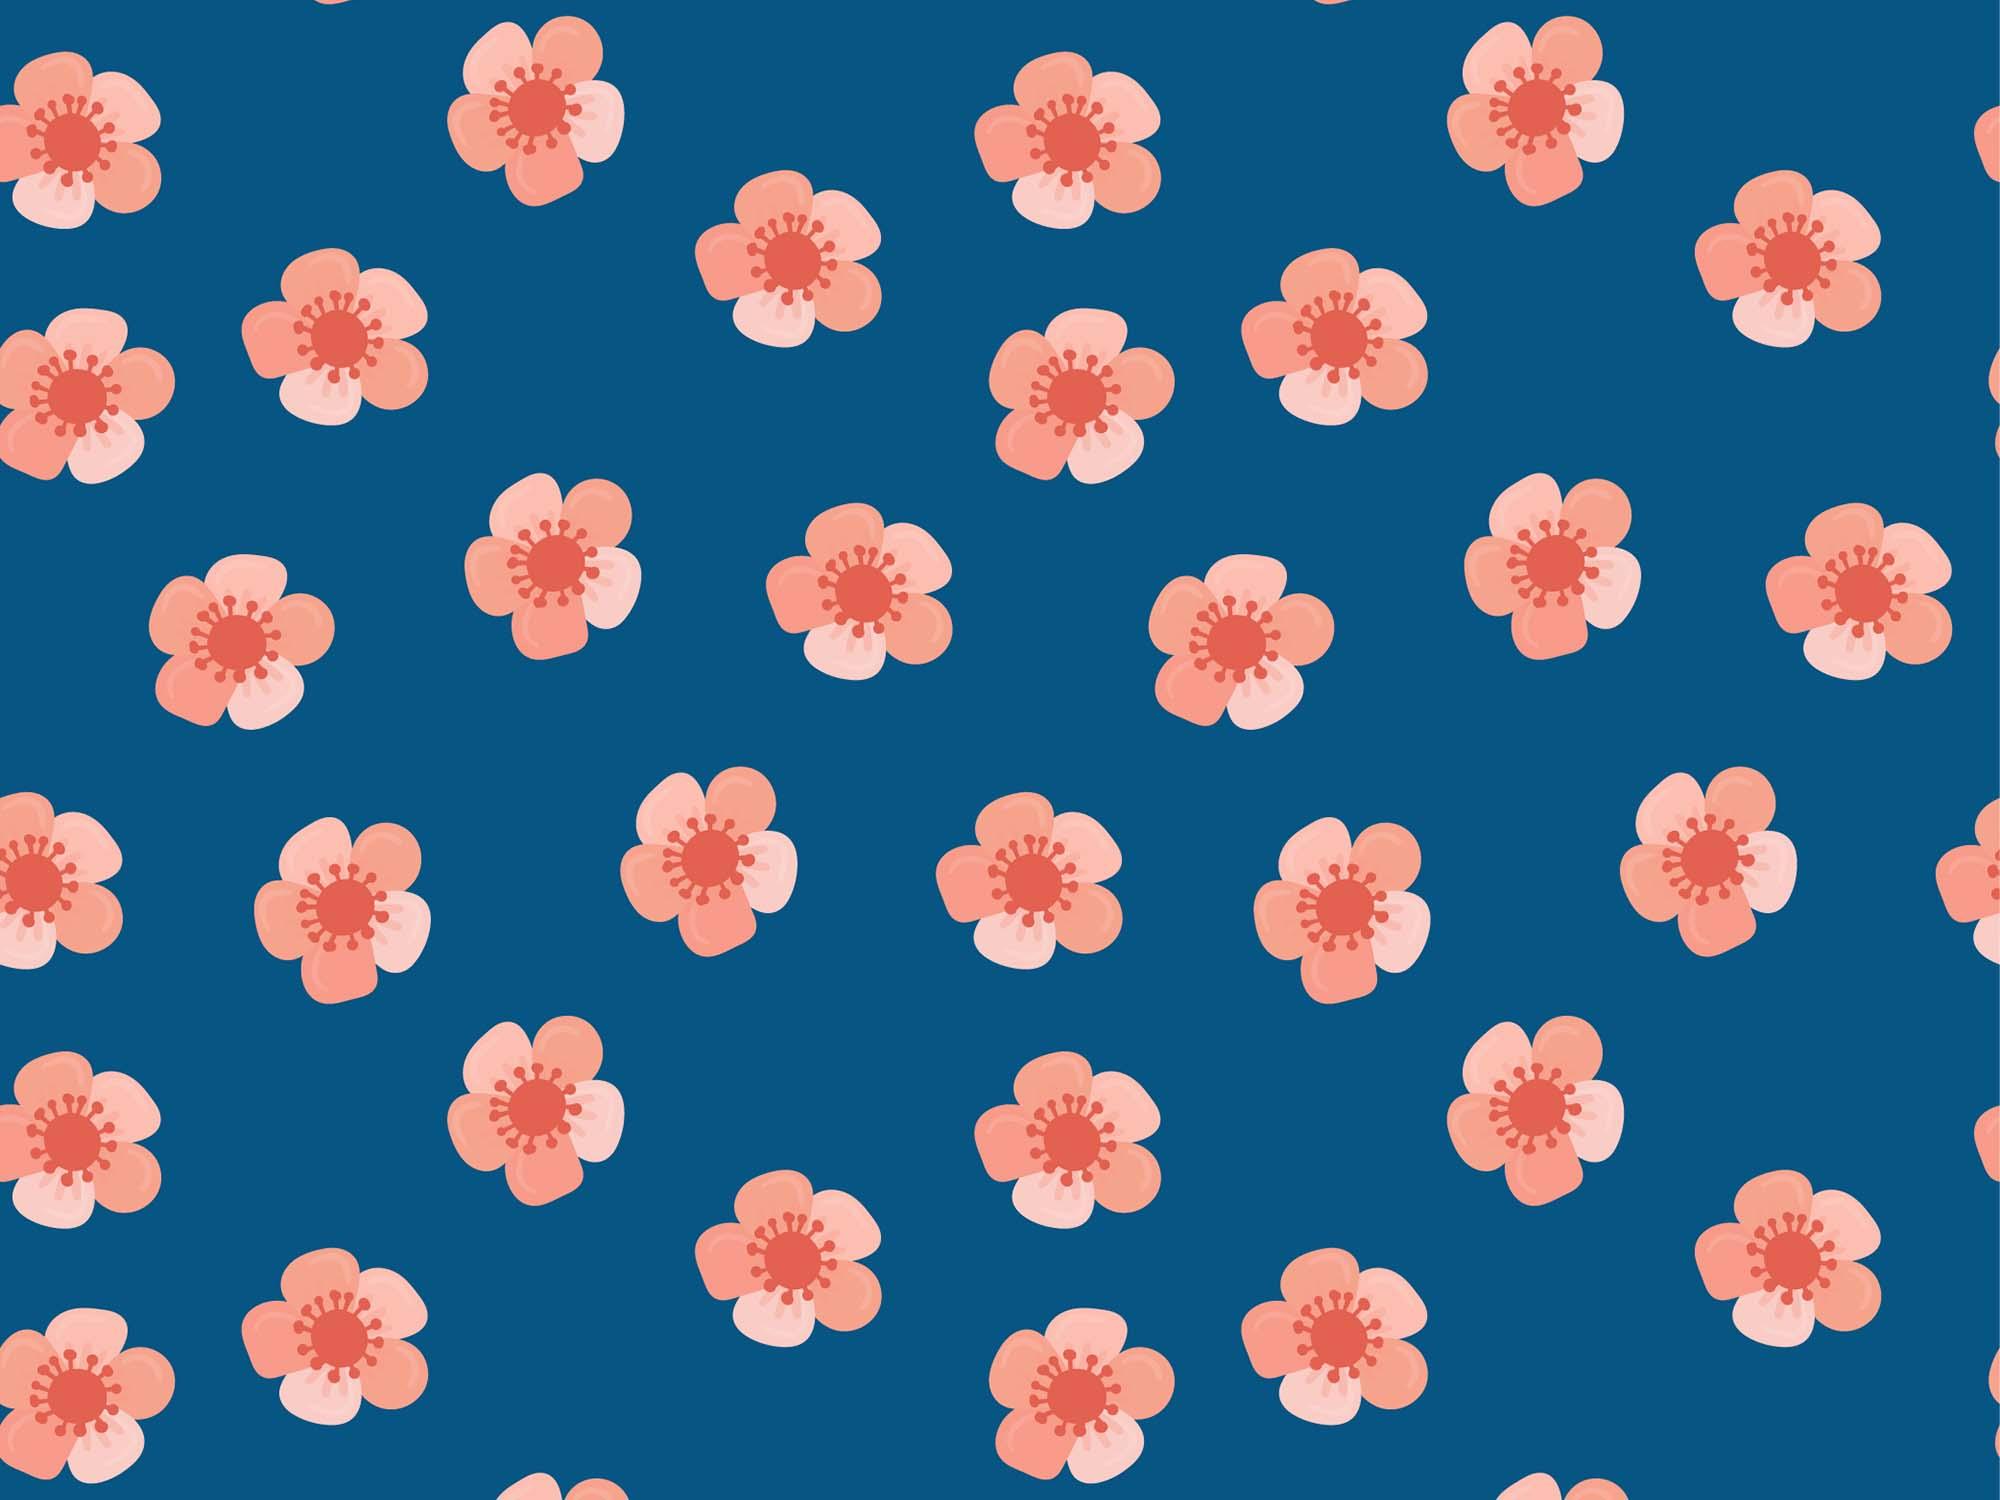 Floral Vector Patterns 6